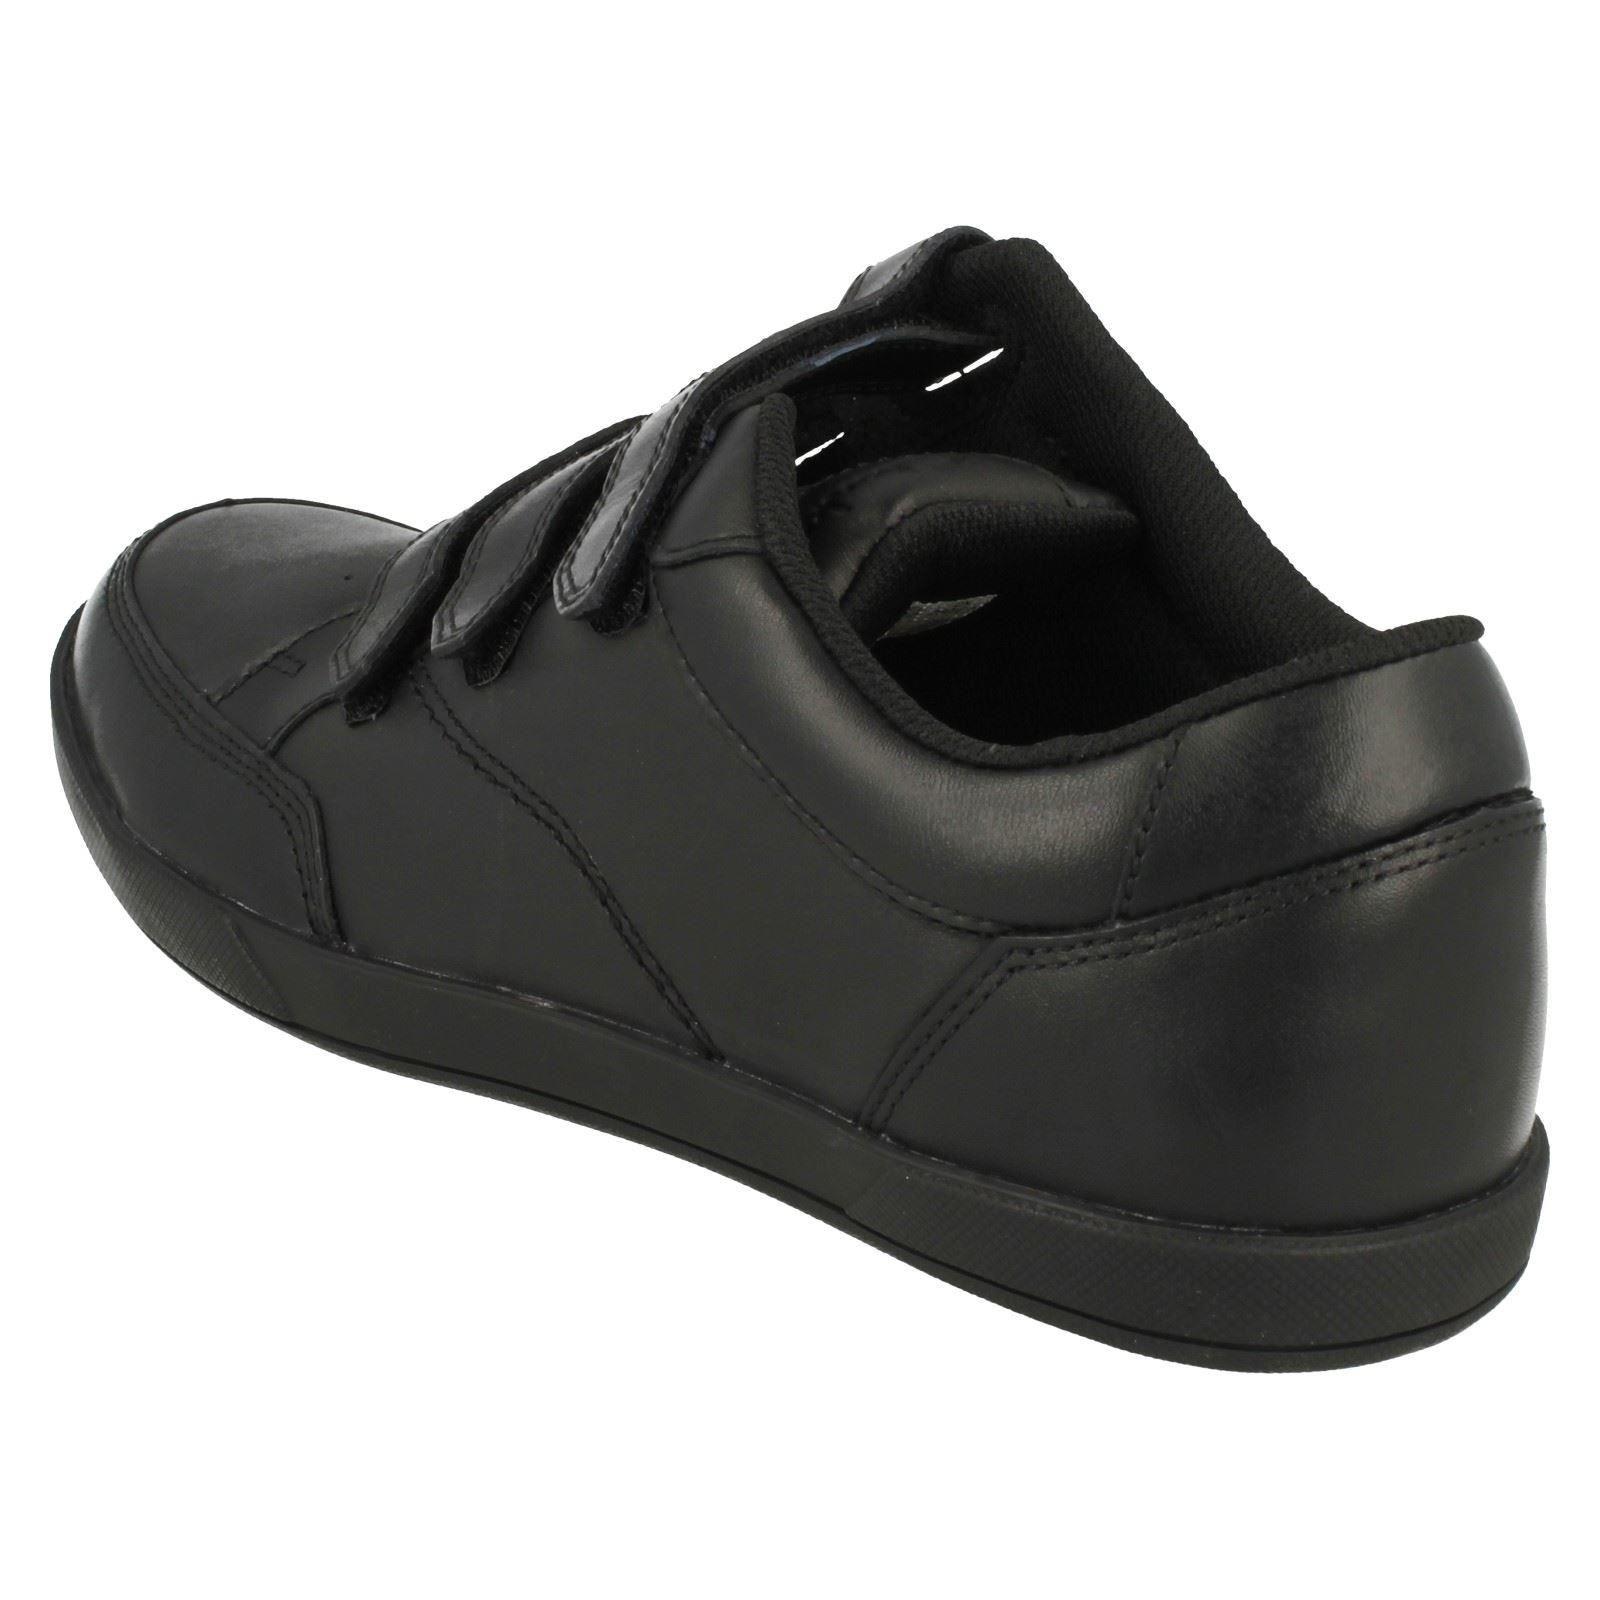 mens clarks velcro fastened smart shoes frontside spin ebay